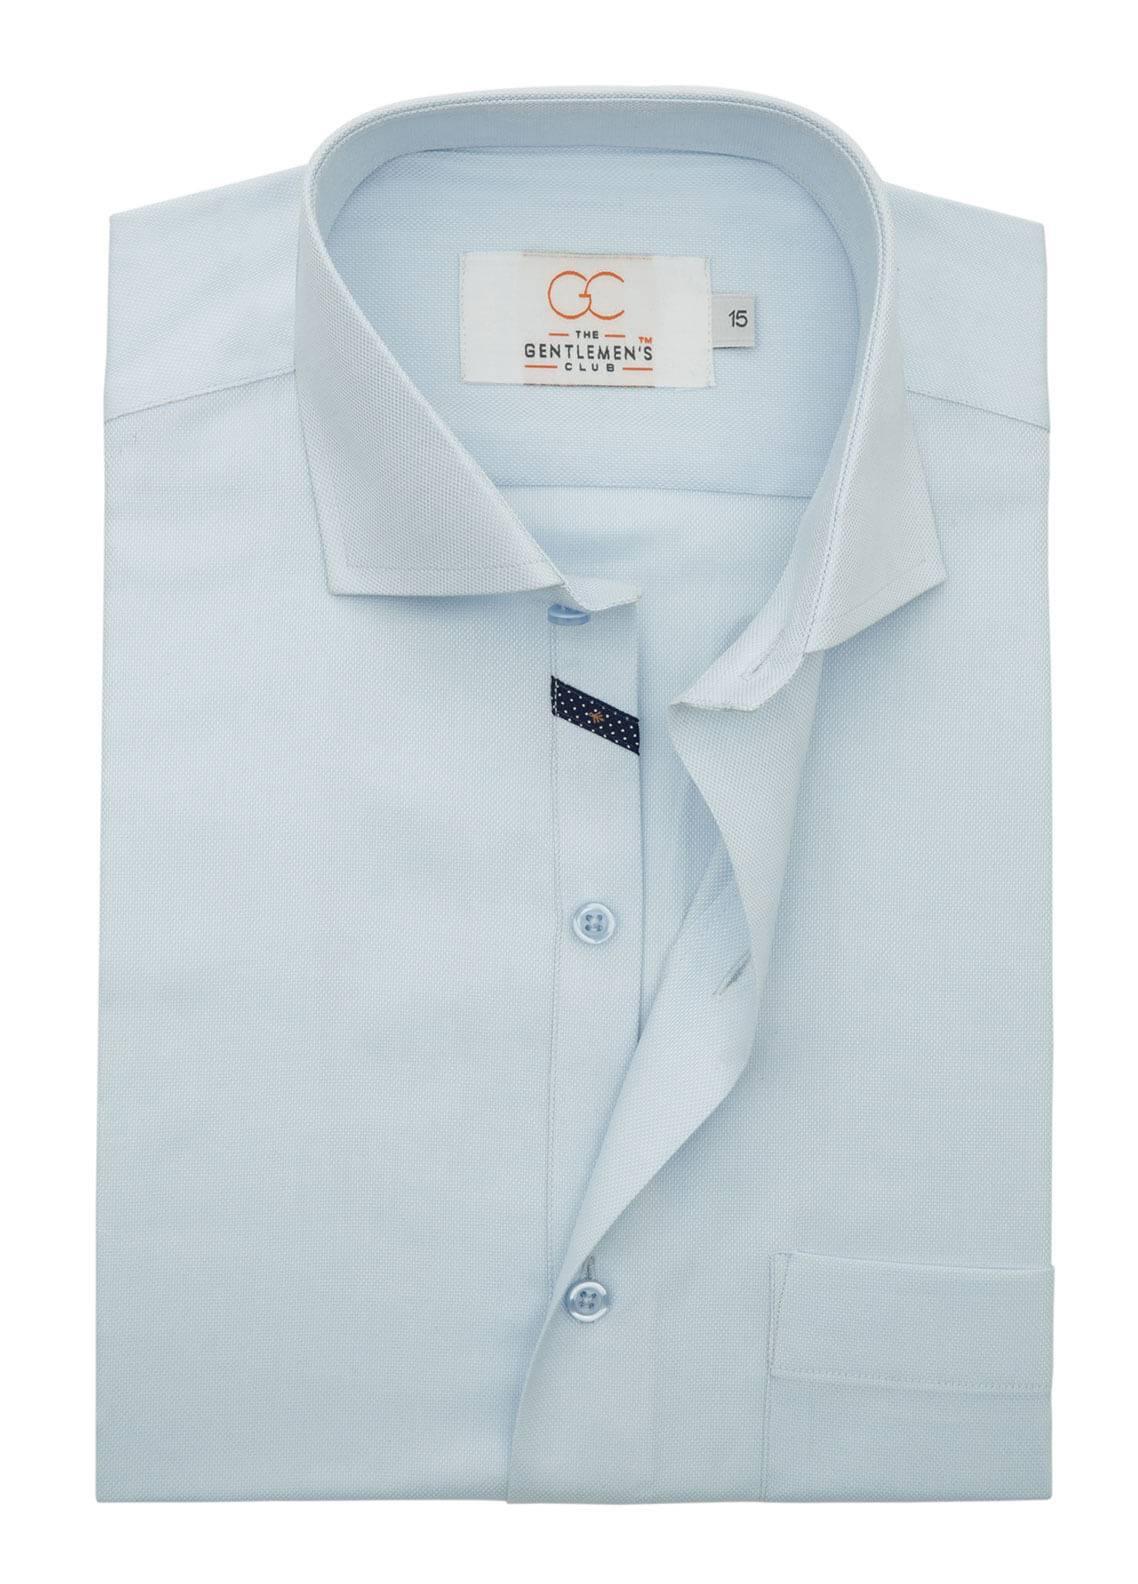 The Gentlemen's Club Cotton Formal Shirts for Men - Sky Blue White Label 4087 - 17.5